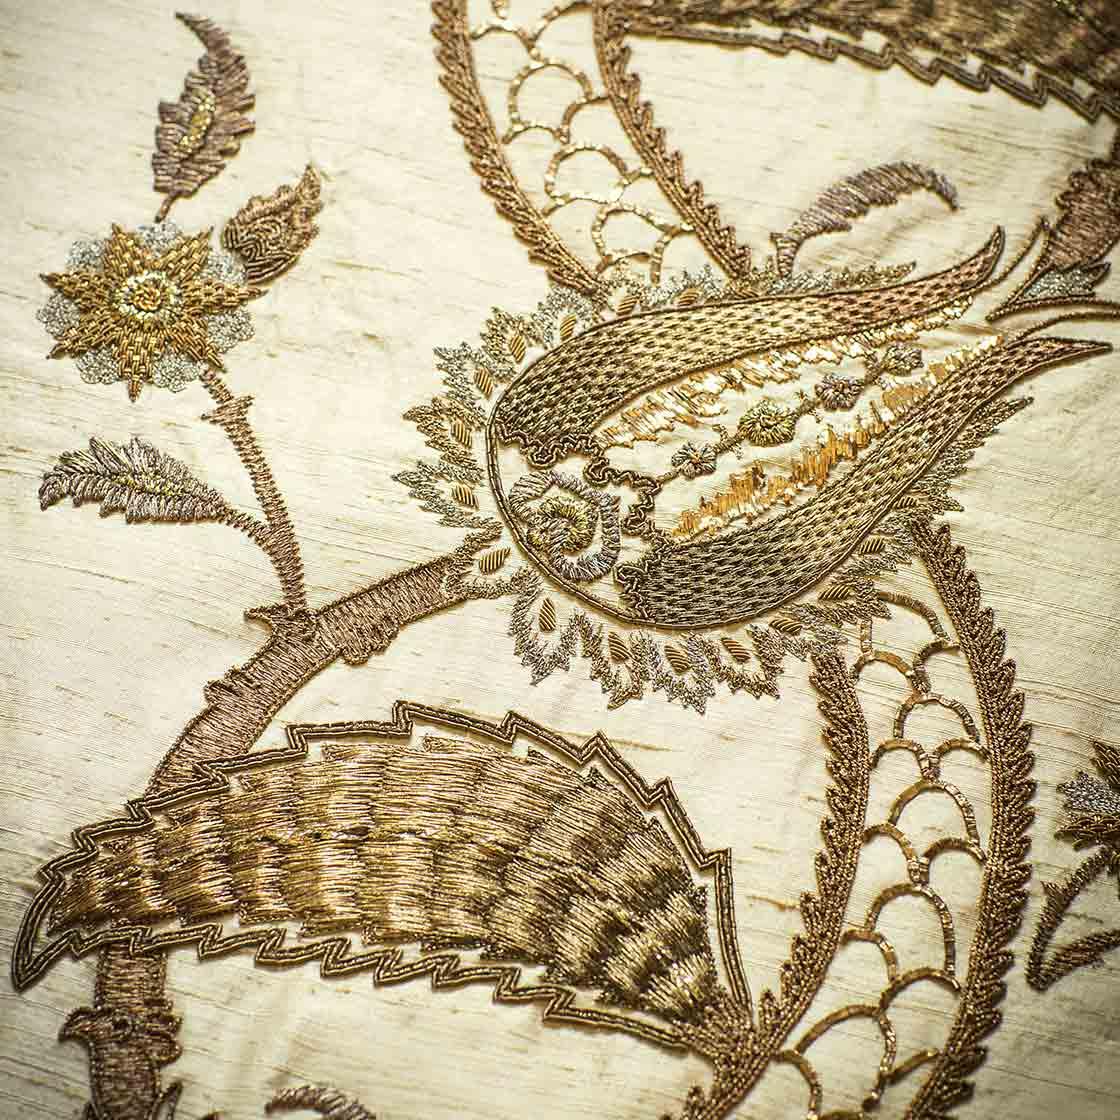 Tuana on Erne silk - Magnolia - Beaumont & Fletcher - Beaumont & Fletcher